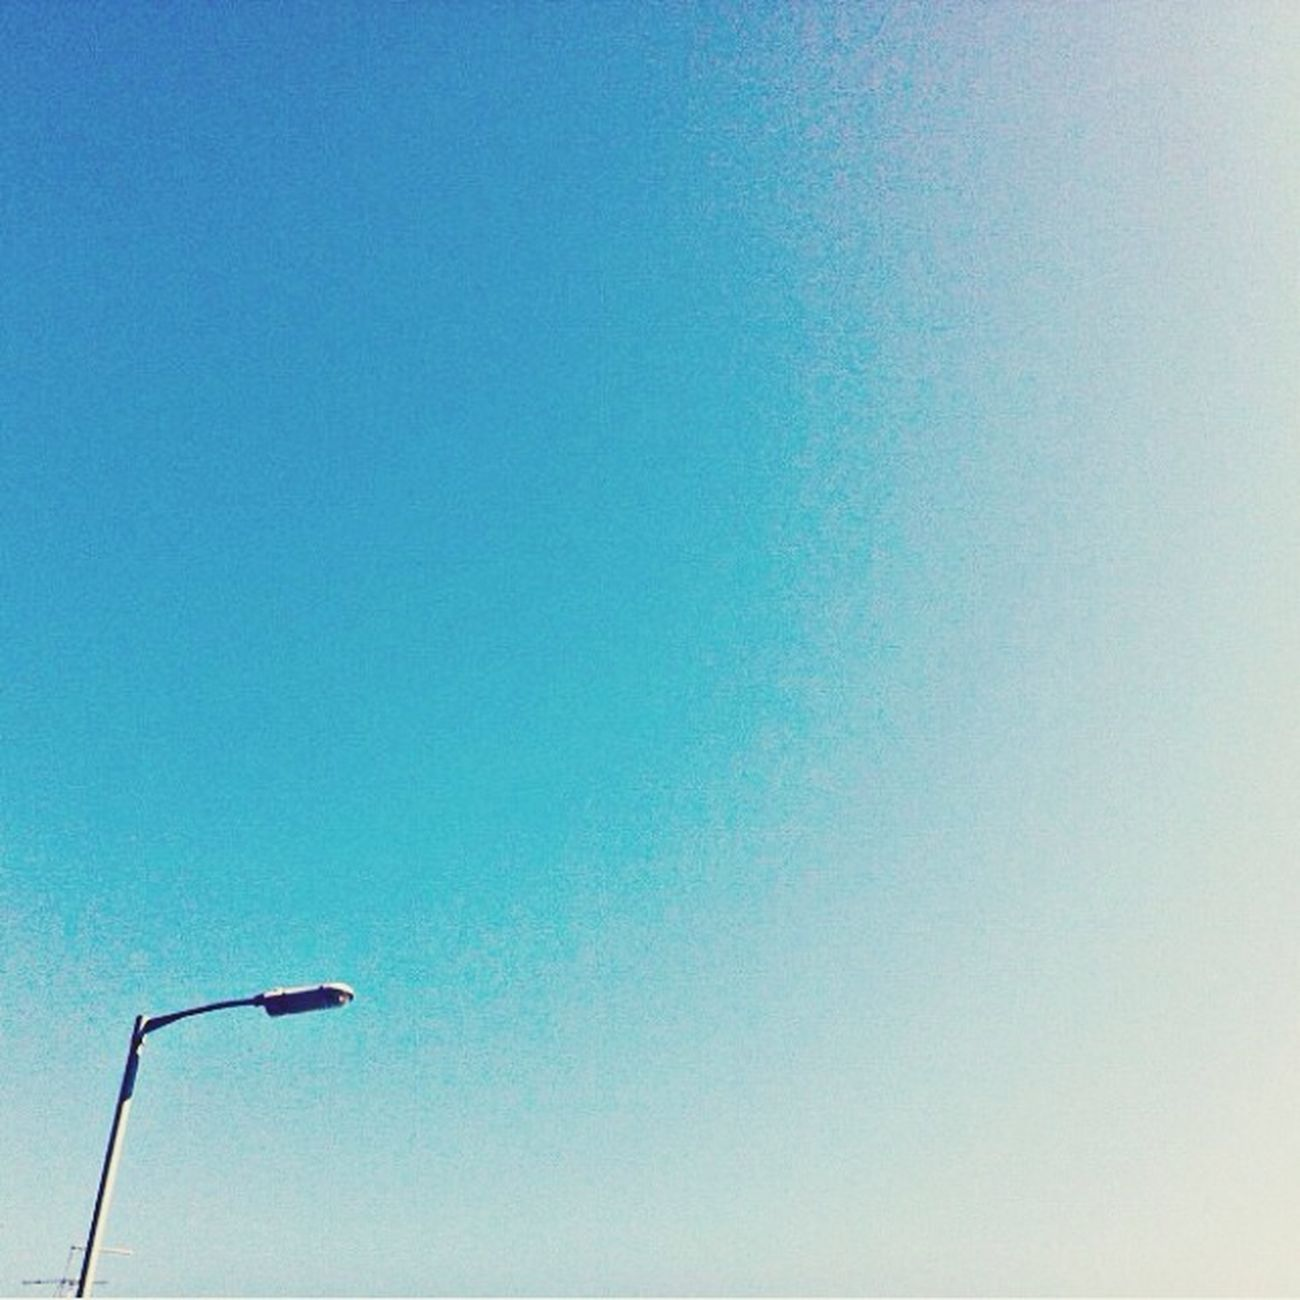 Enjoying The Sun Iphonephotography IPSMinimalism Supernormal